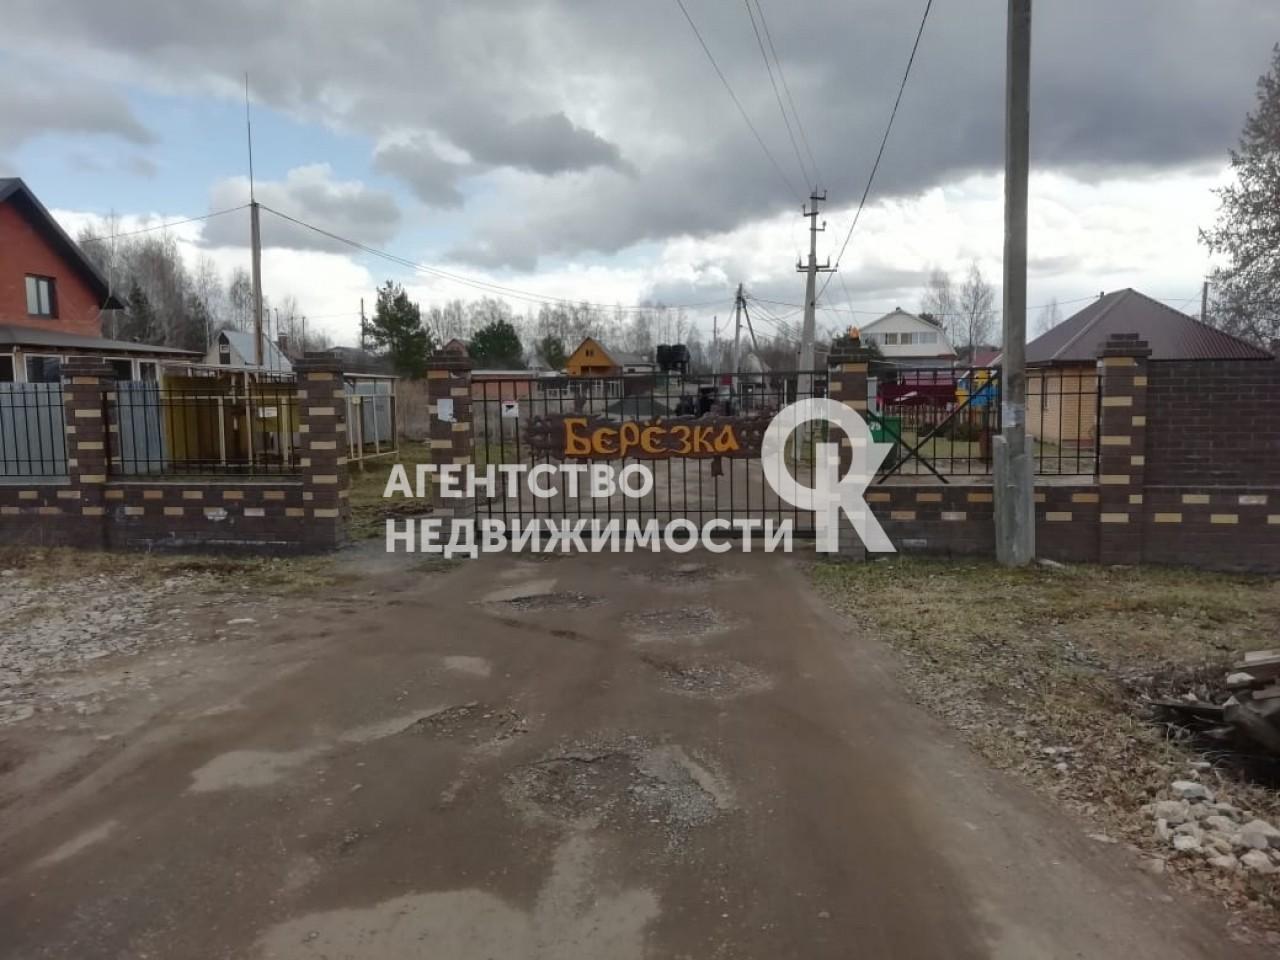 Продажа  участка Республика Татарстан, Березка Территория снт.